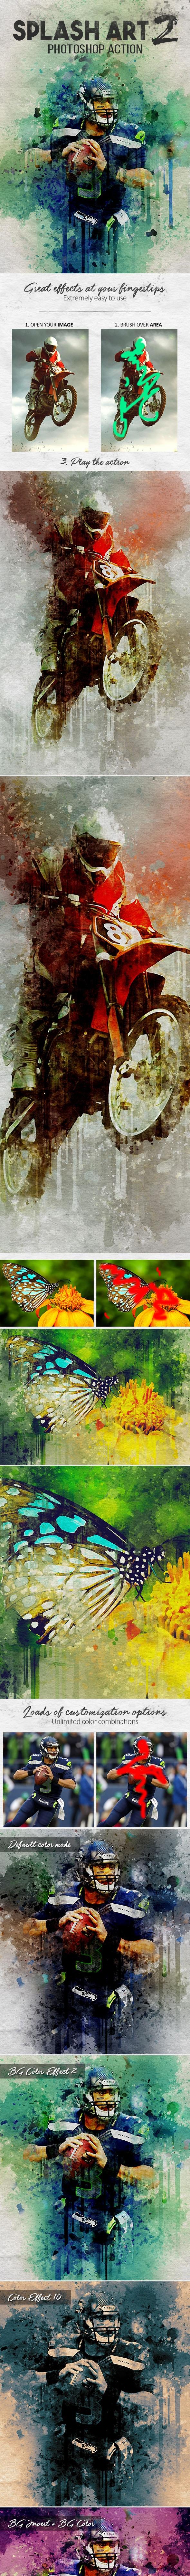 Splash Art 2 Photoshop Action - Photo Effects Actions